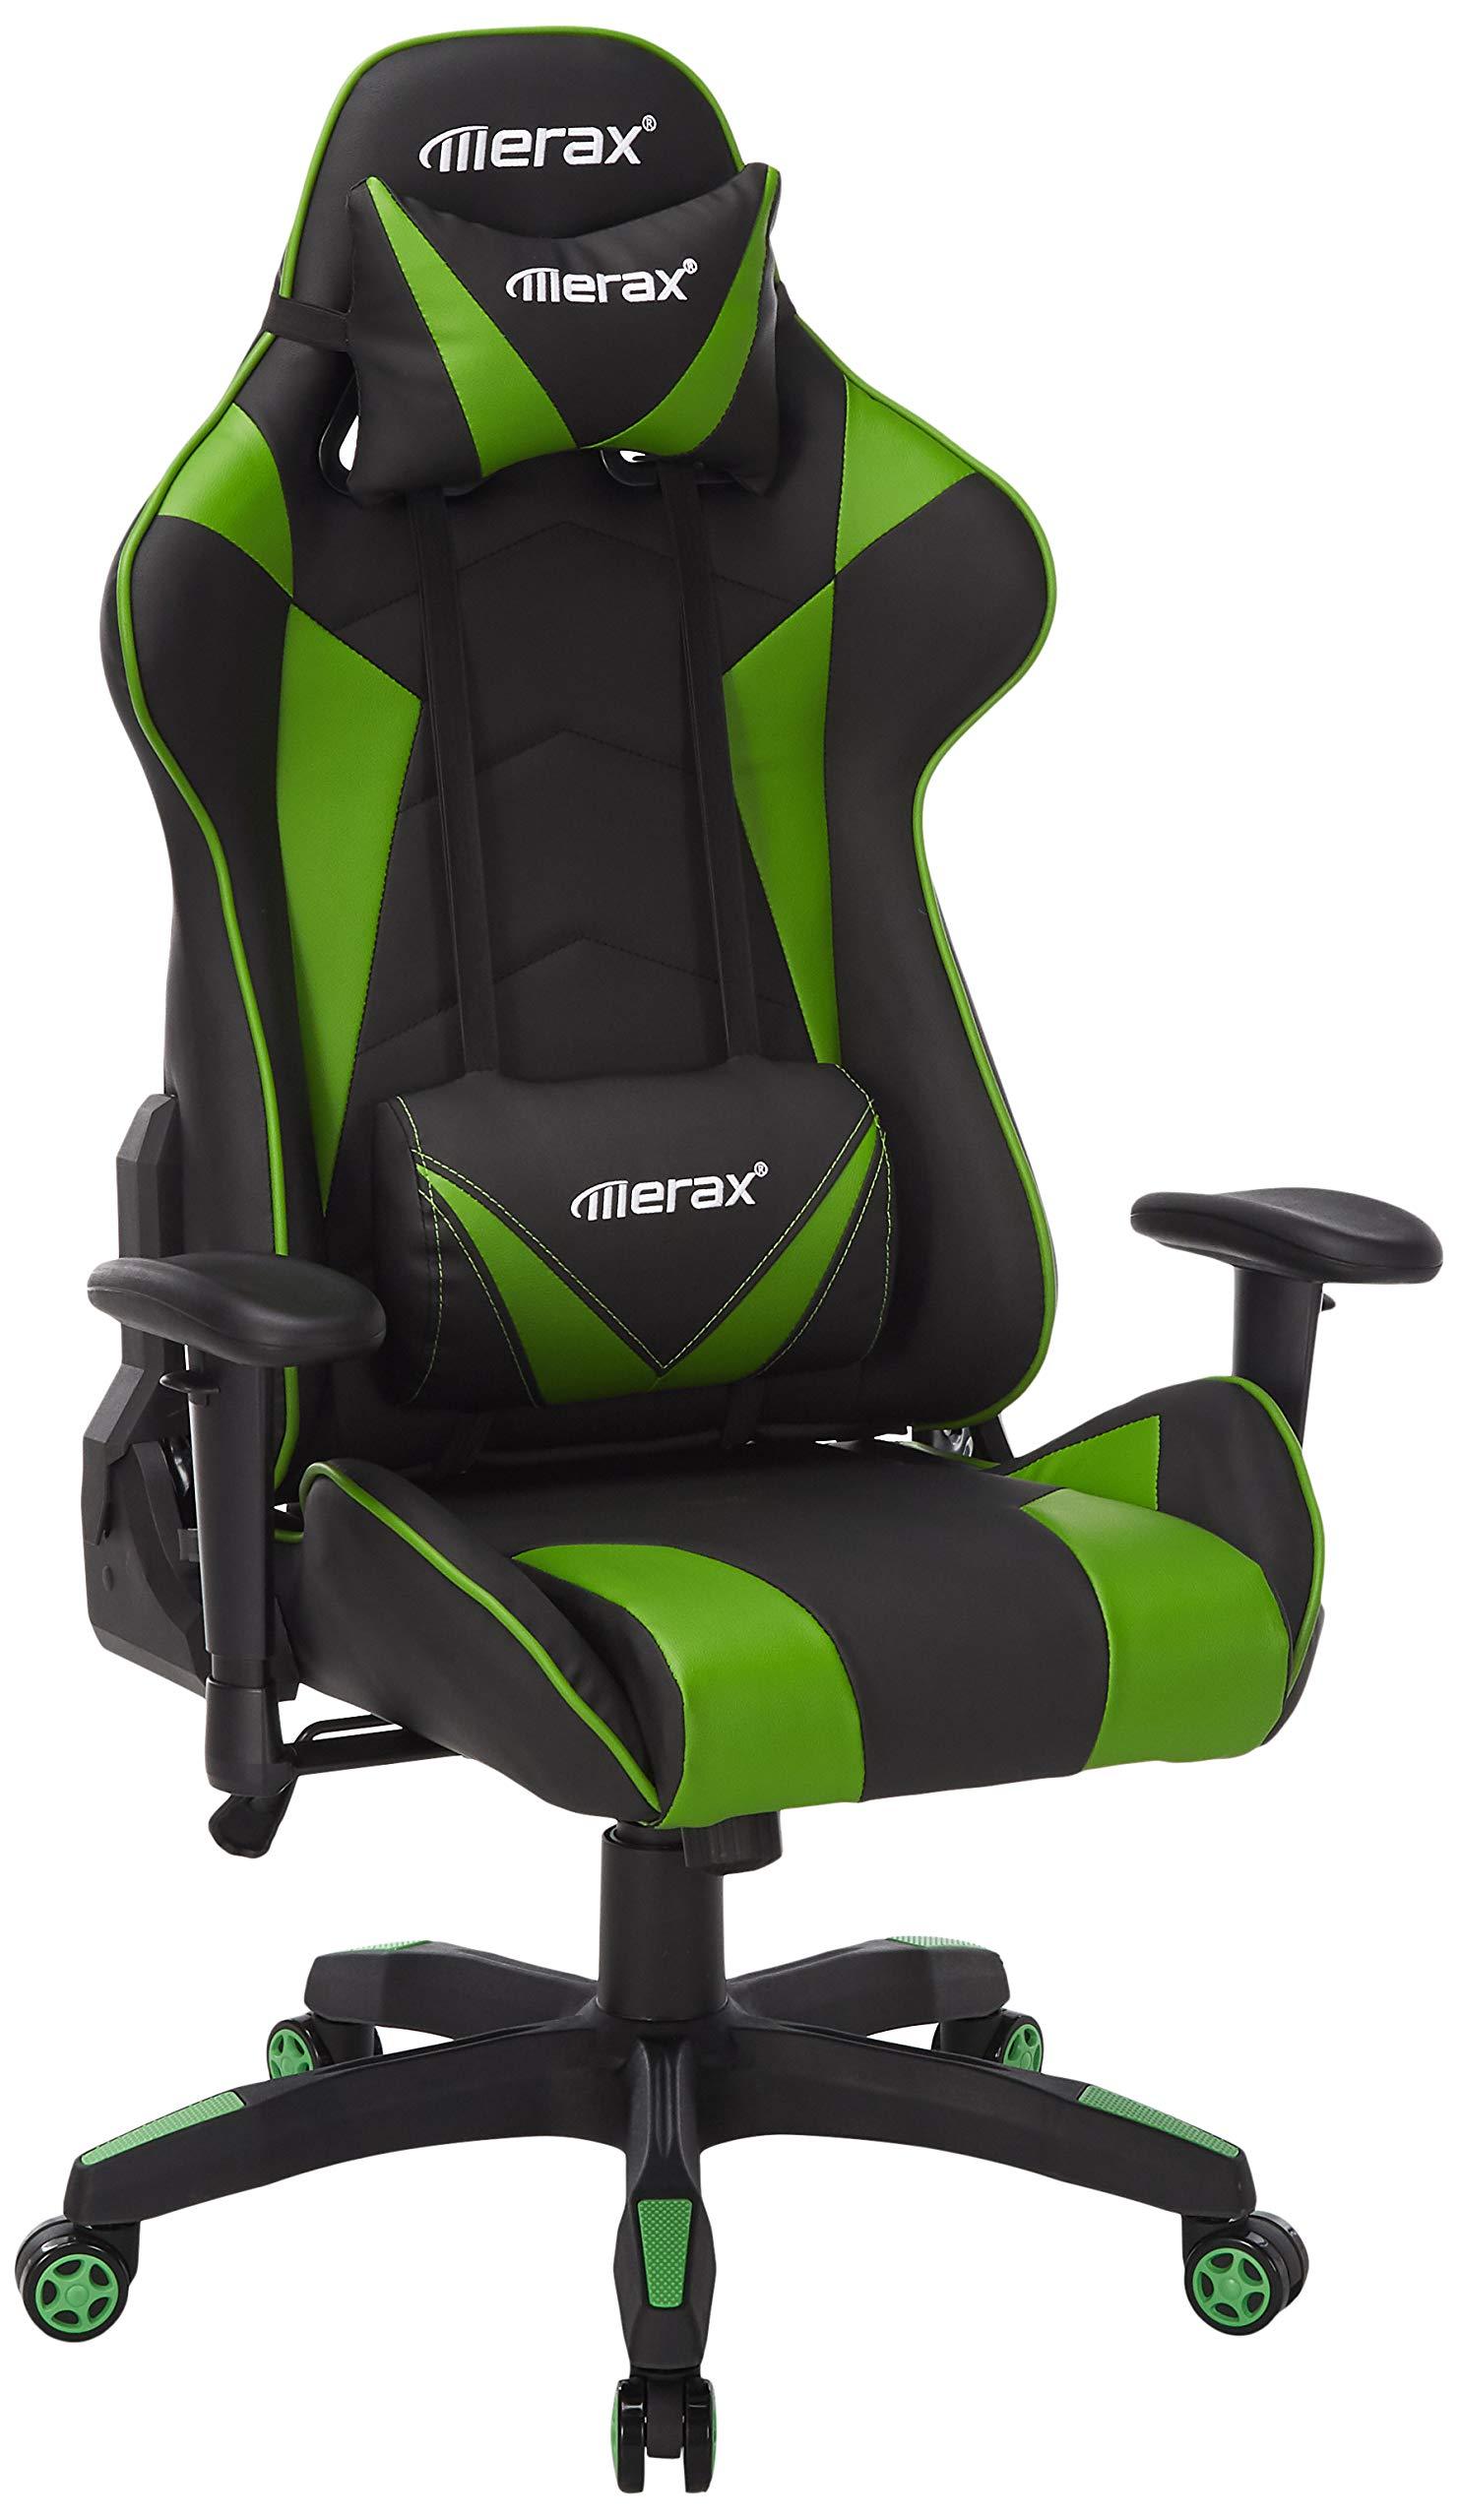 Merax Gaming Chair High Back Computer Chair Ergonomic Design Racing